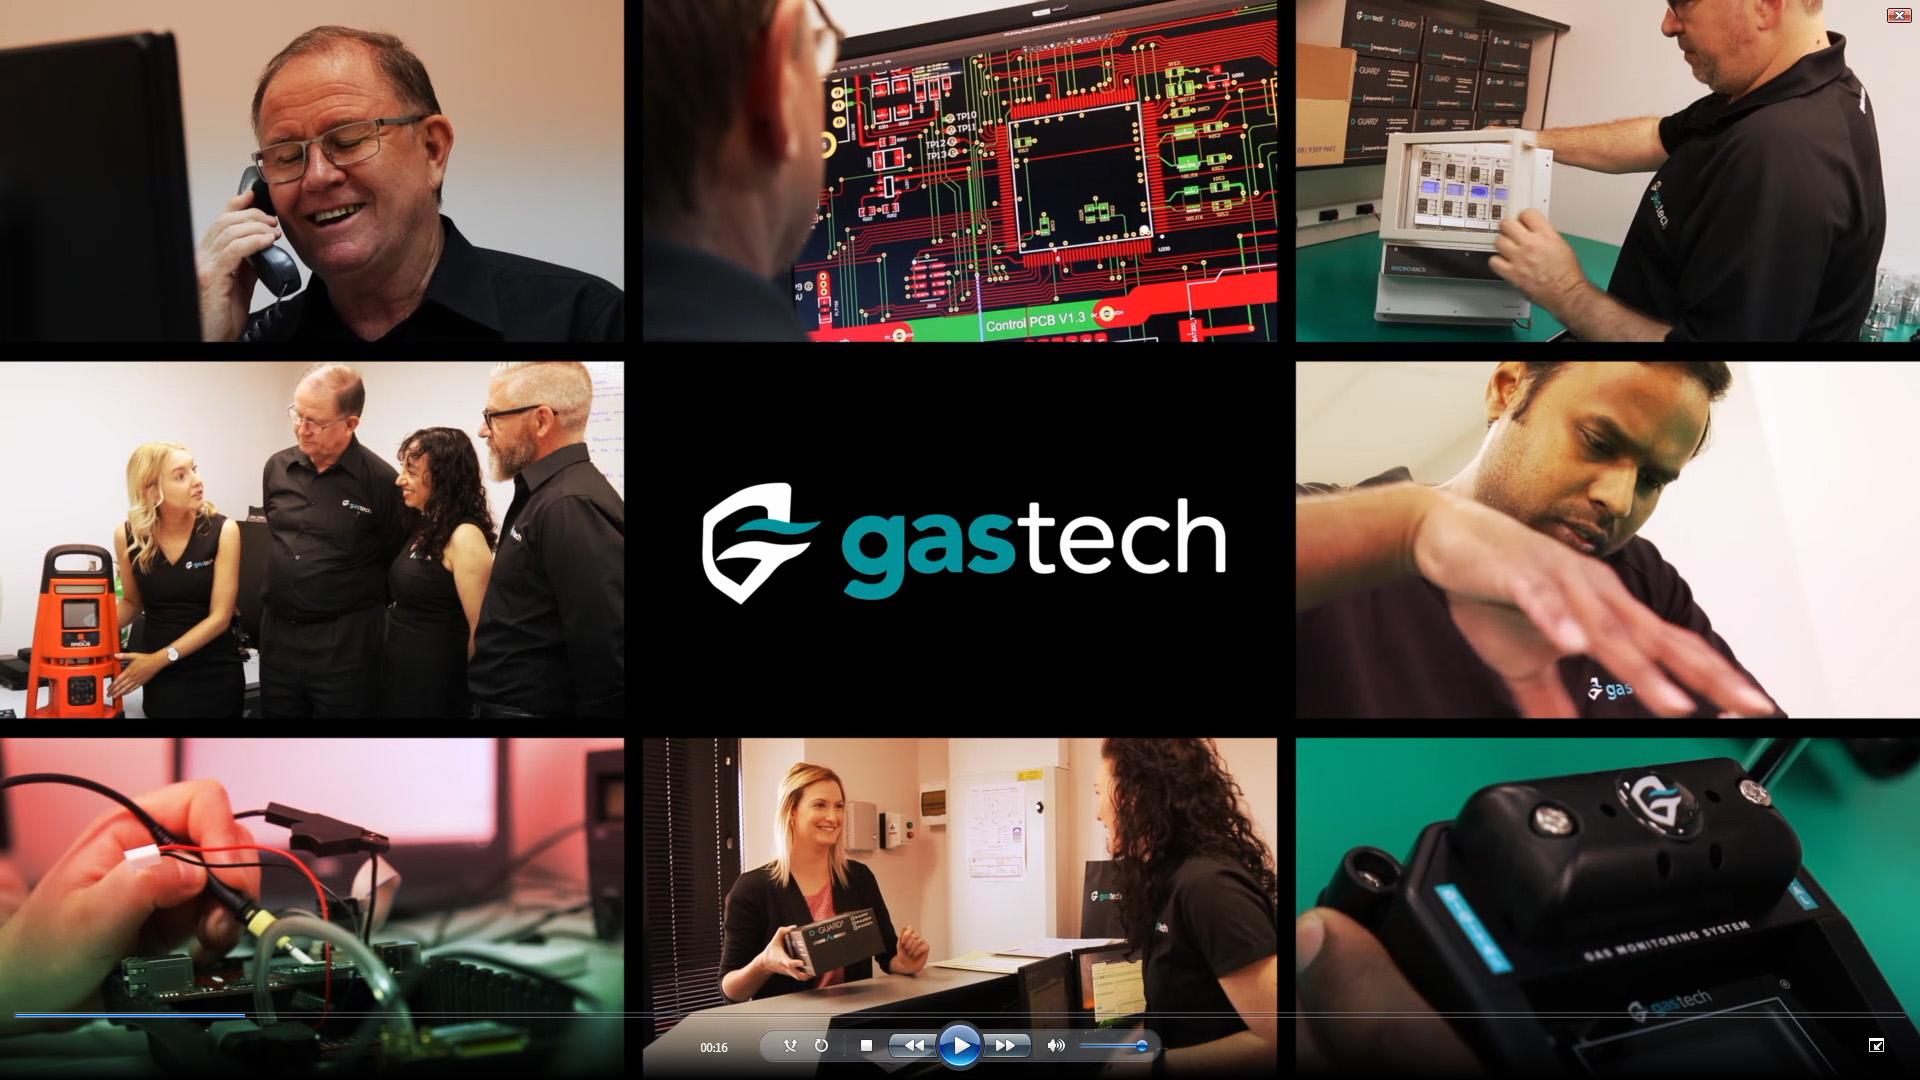 Gastech 2018 Brand Launch